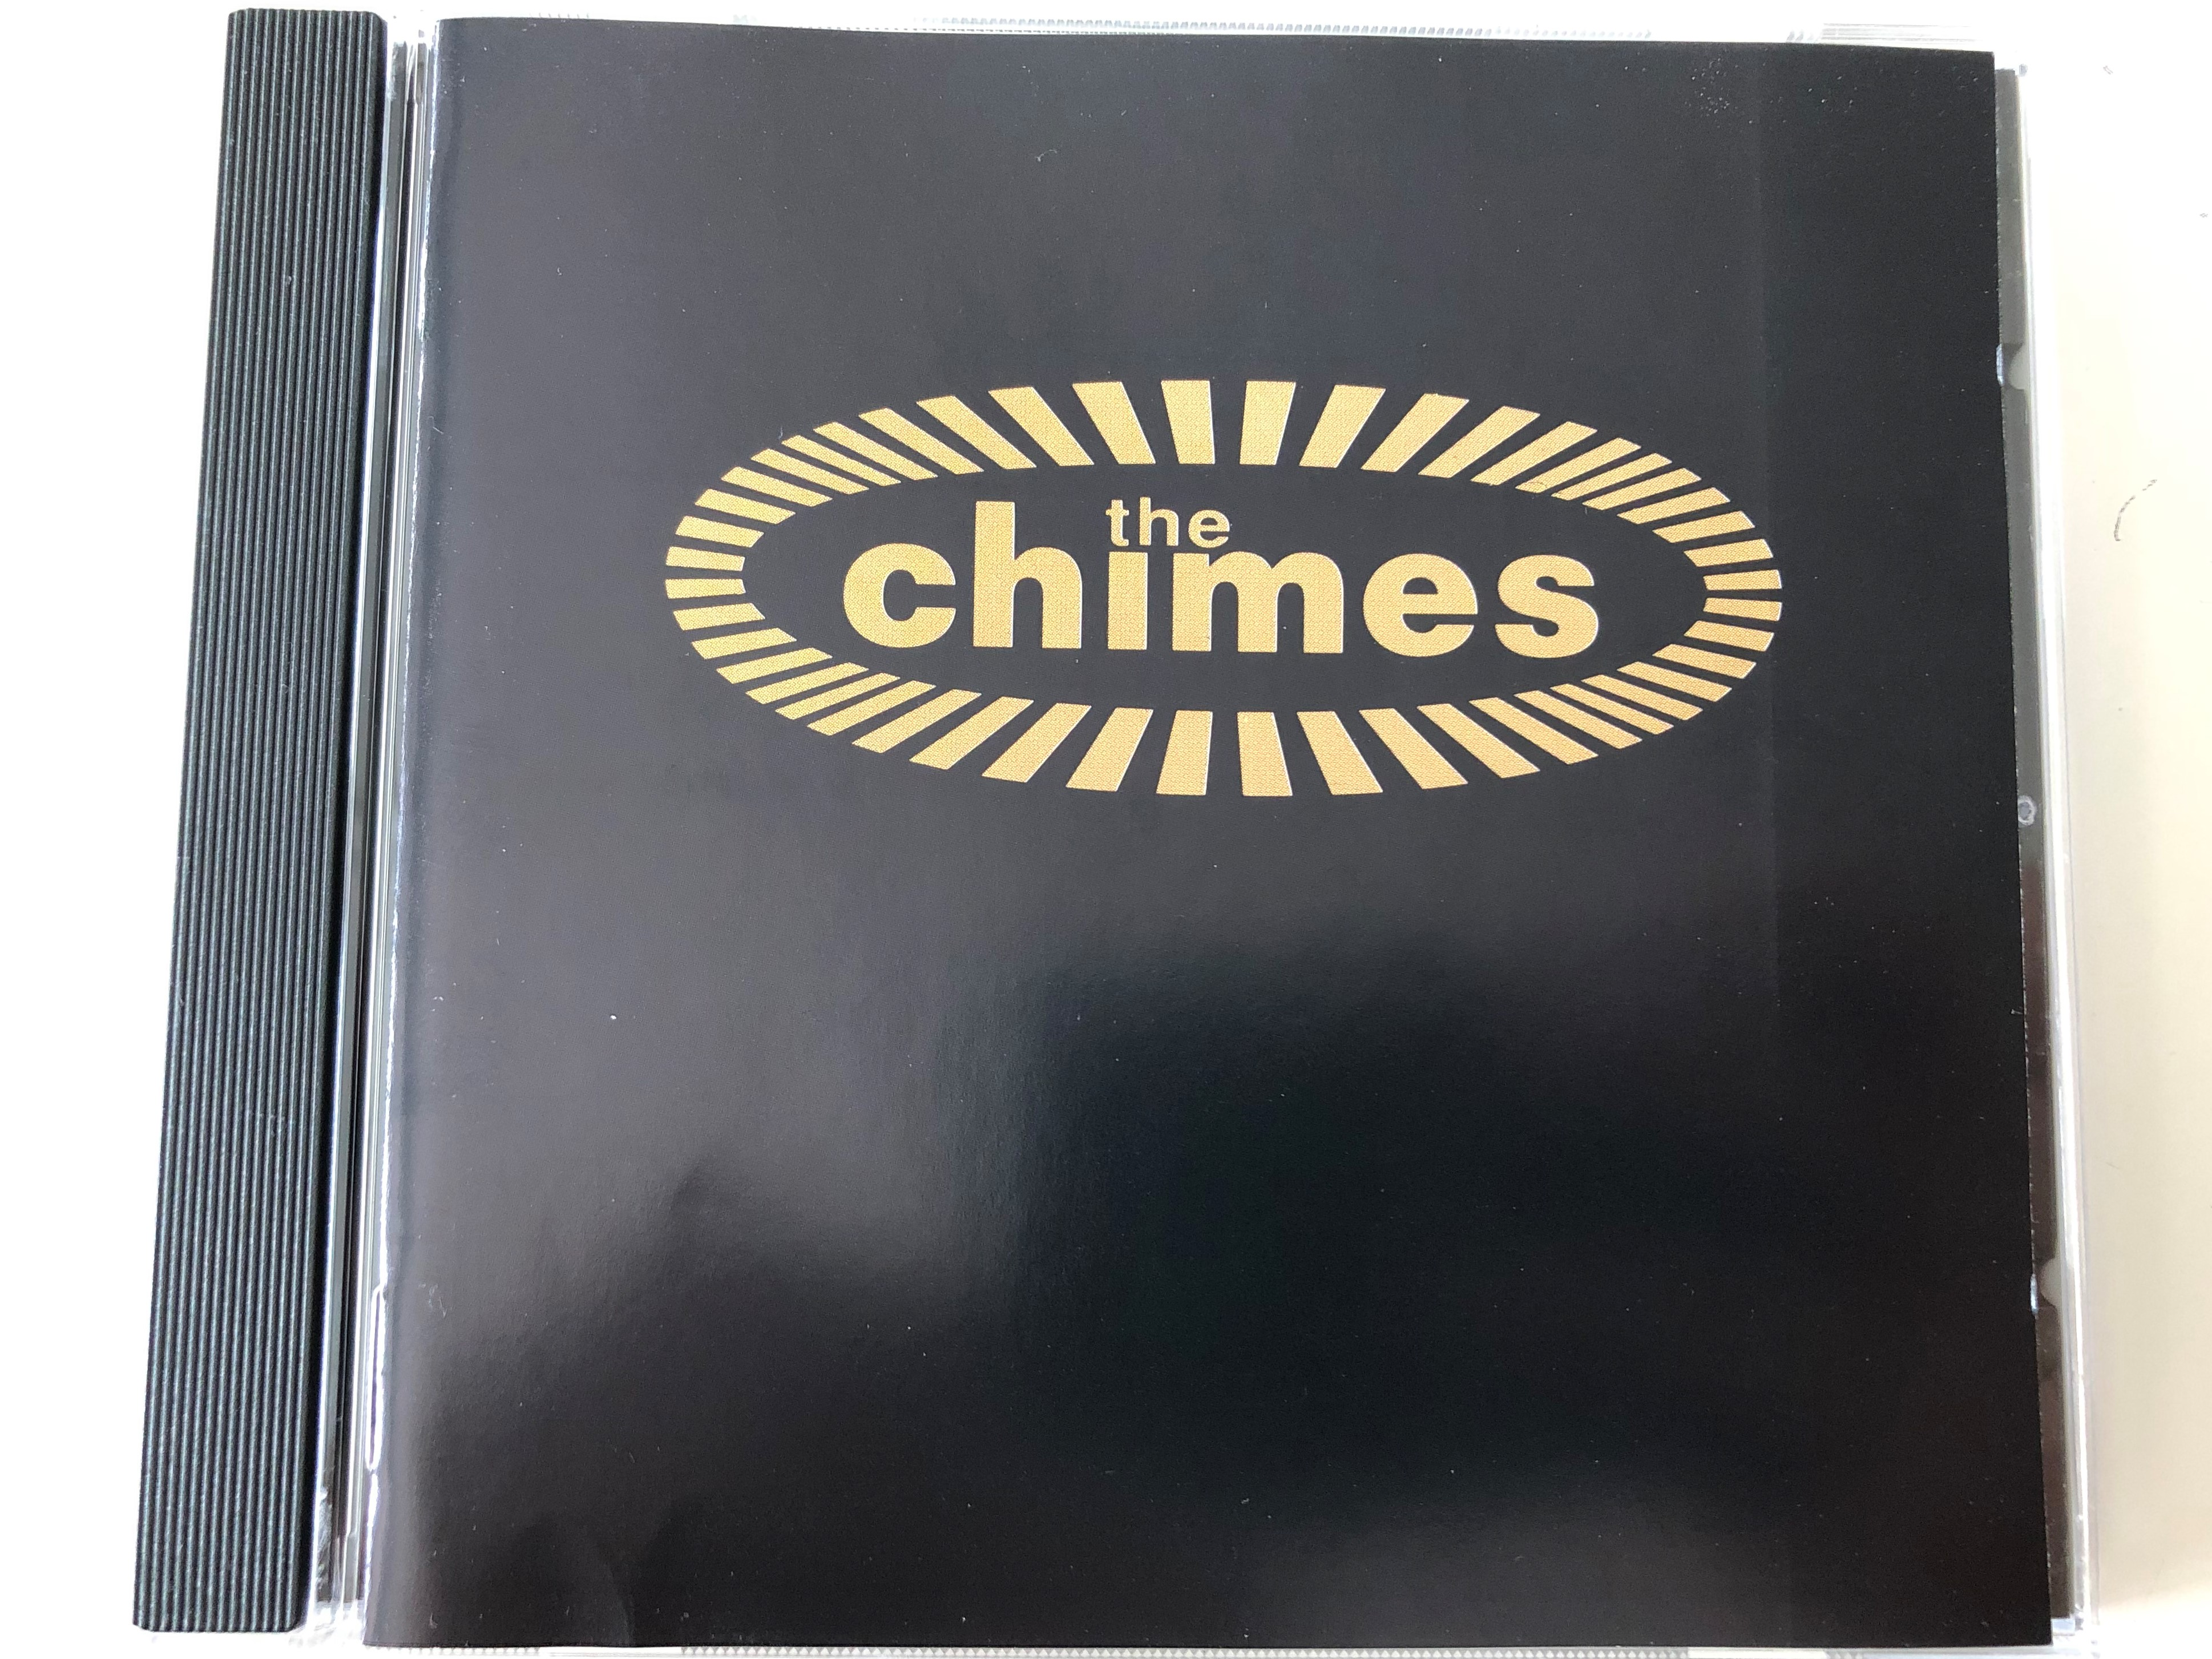 the-chimes-columbia-audio-cd-1990-466481-2-1-.jpg